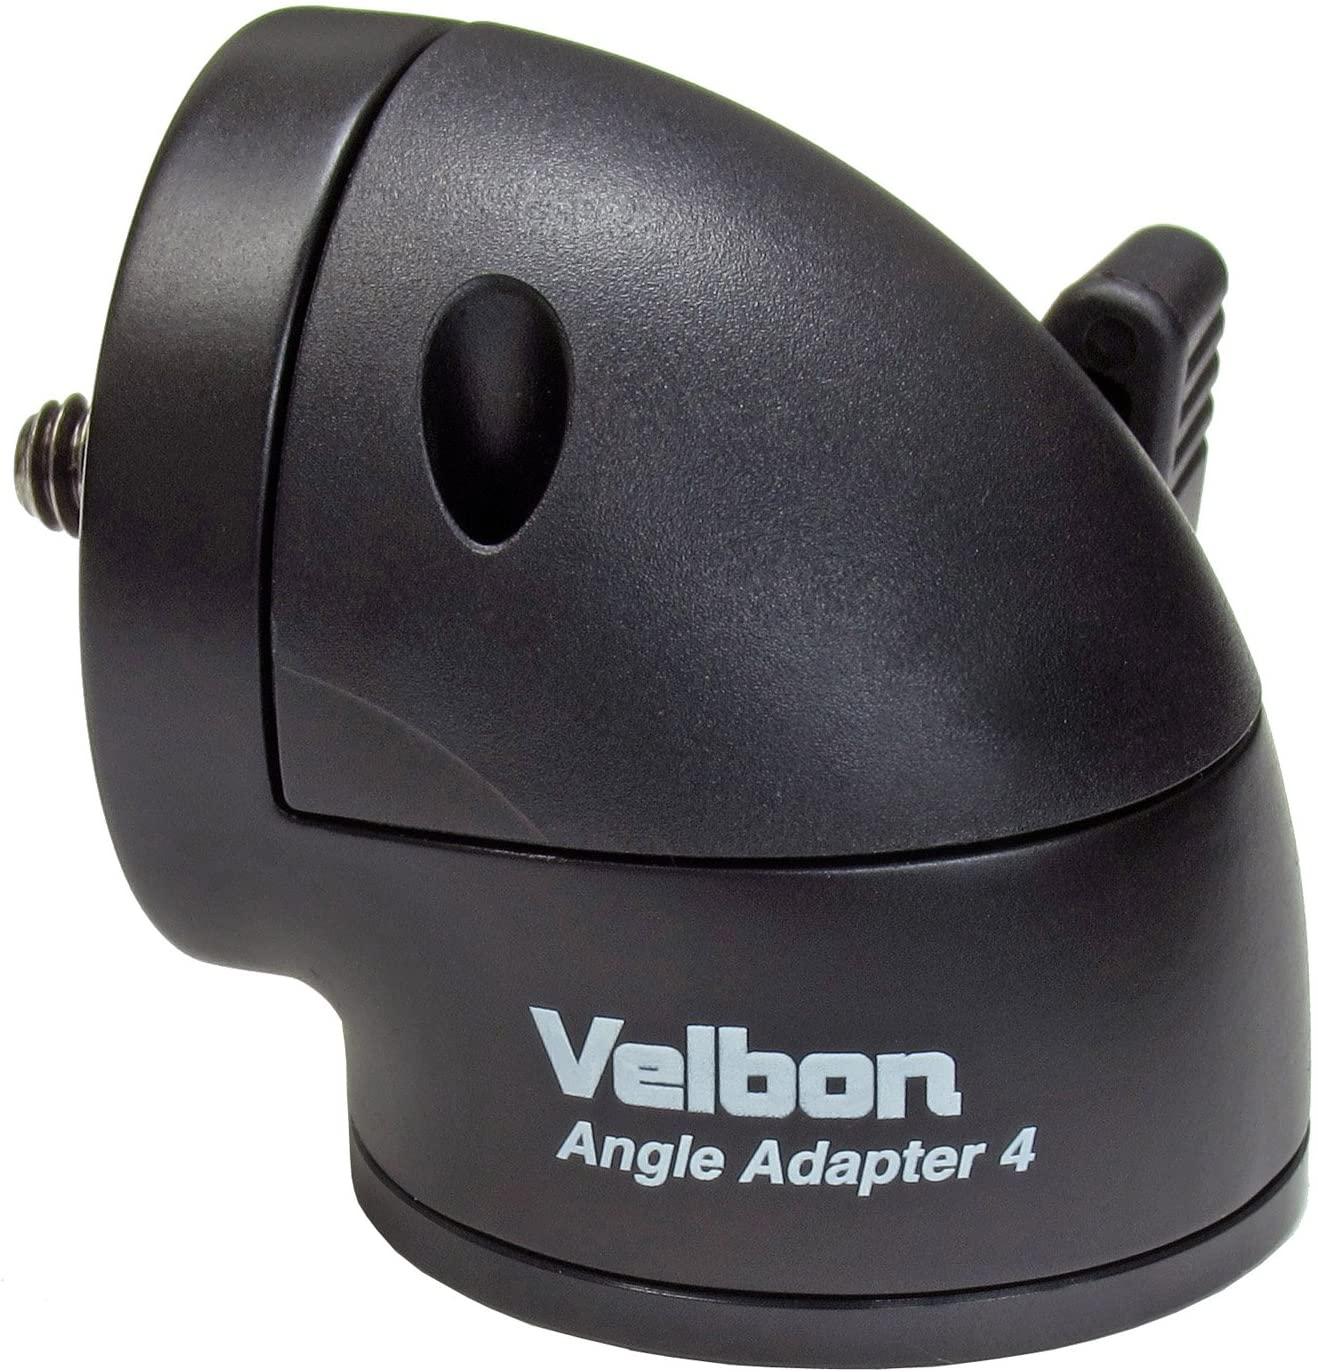 Velbon Angle Adapter 4 for Tripod - Black